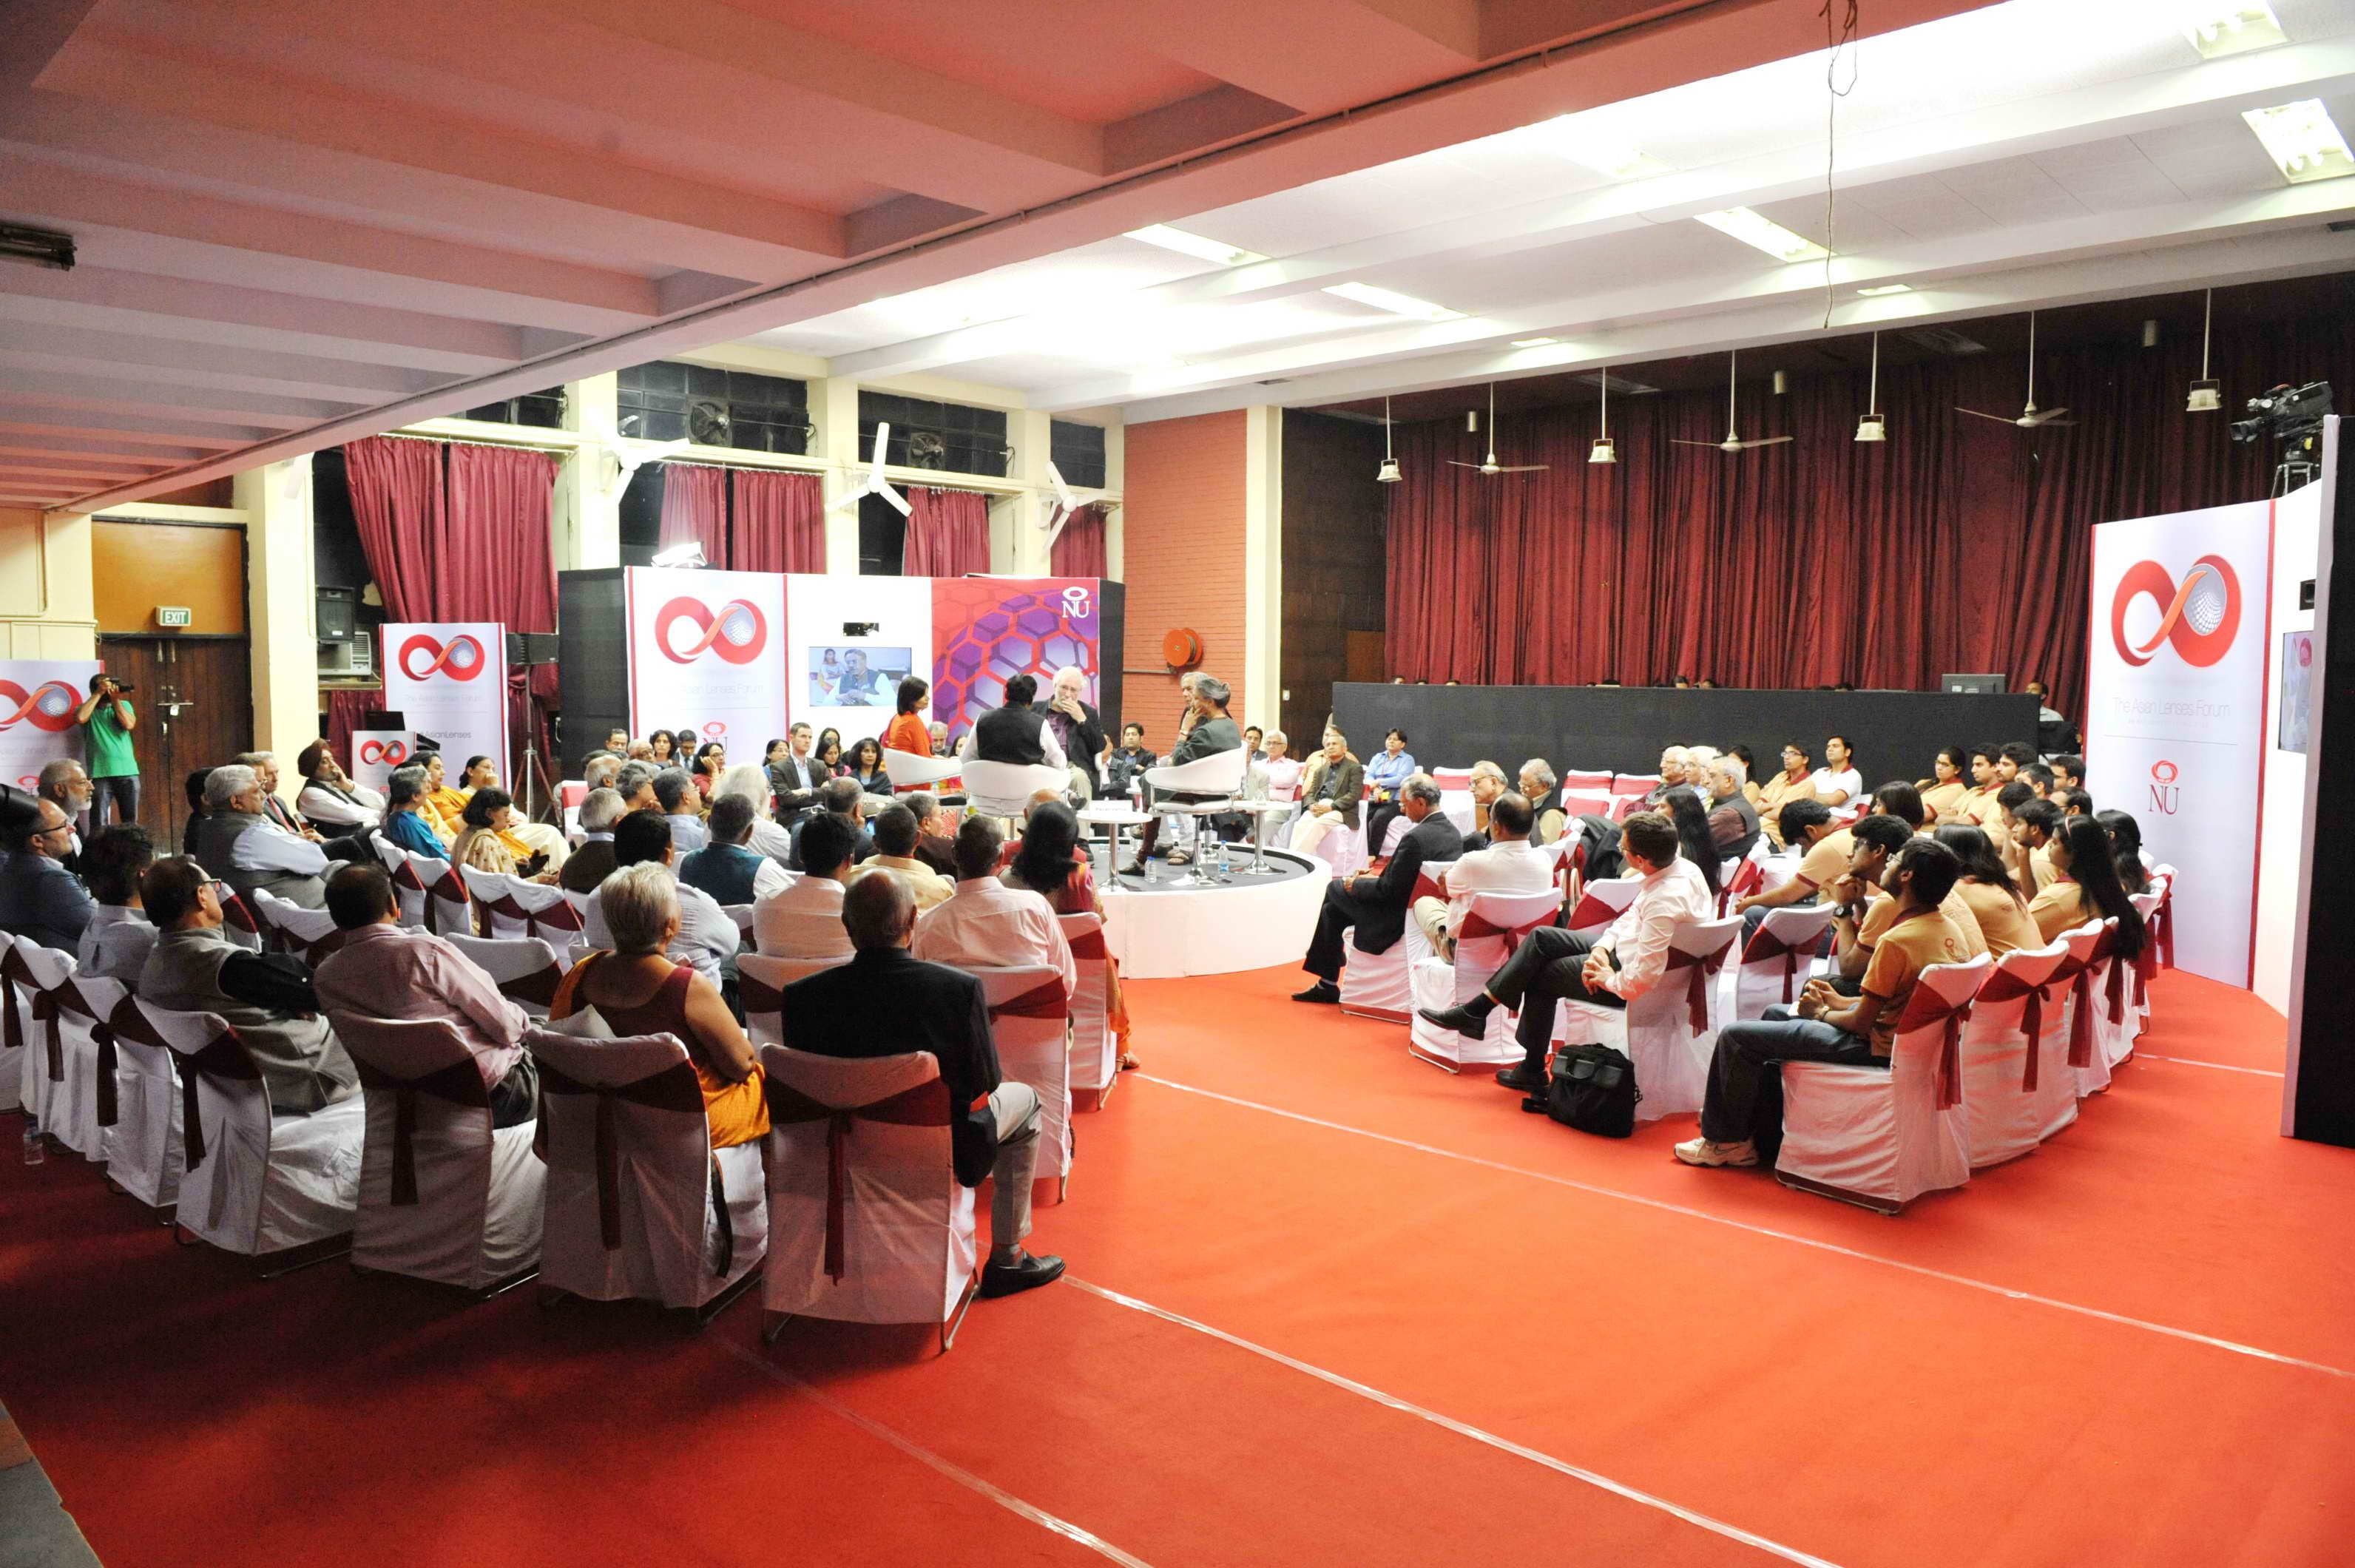 TALF - 1st Annual Conference